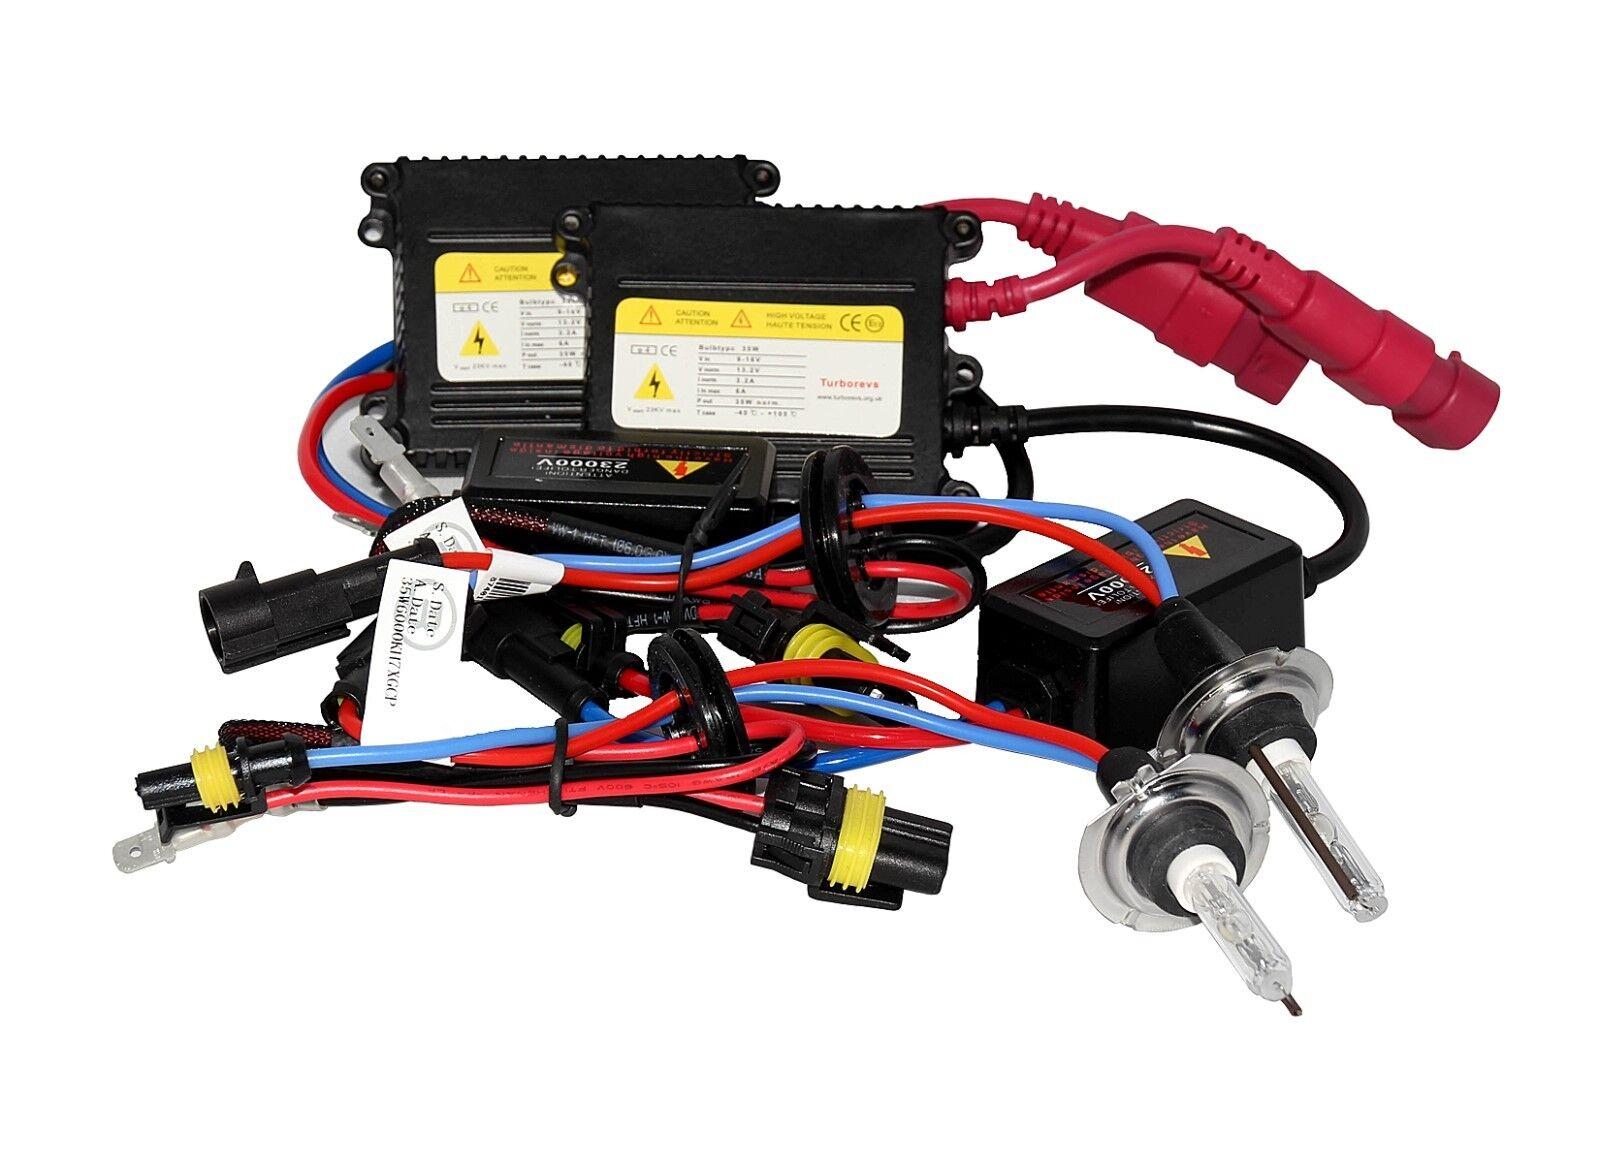 Peugeot 206 406 206cc 306 Cc Hid Xenon Conversion Light Kit H7 Ac Ebay Wiring System